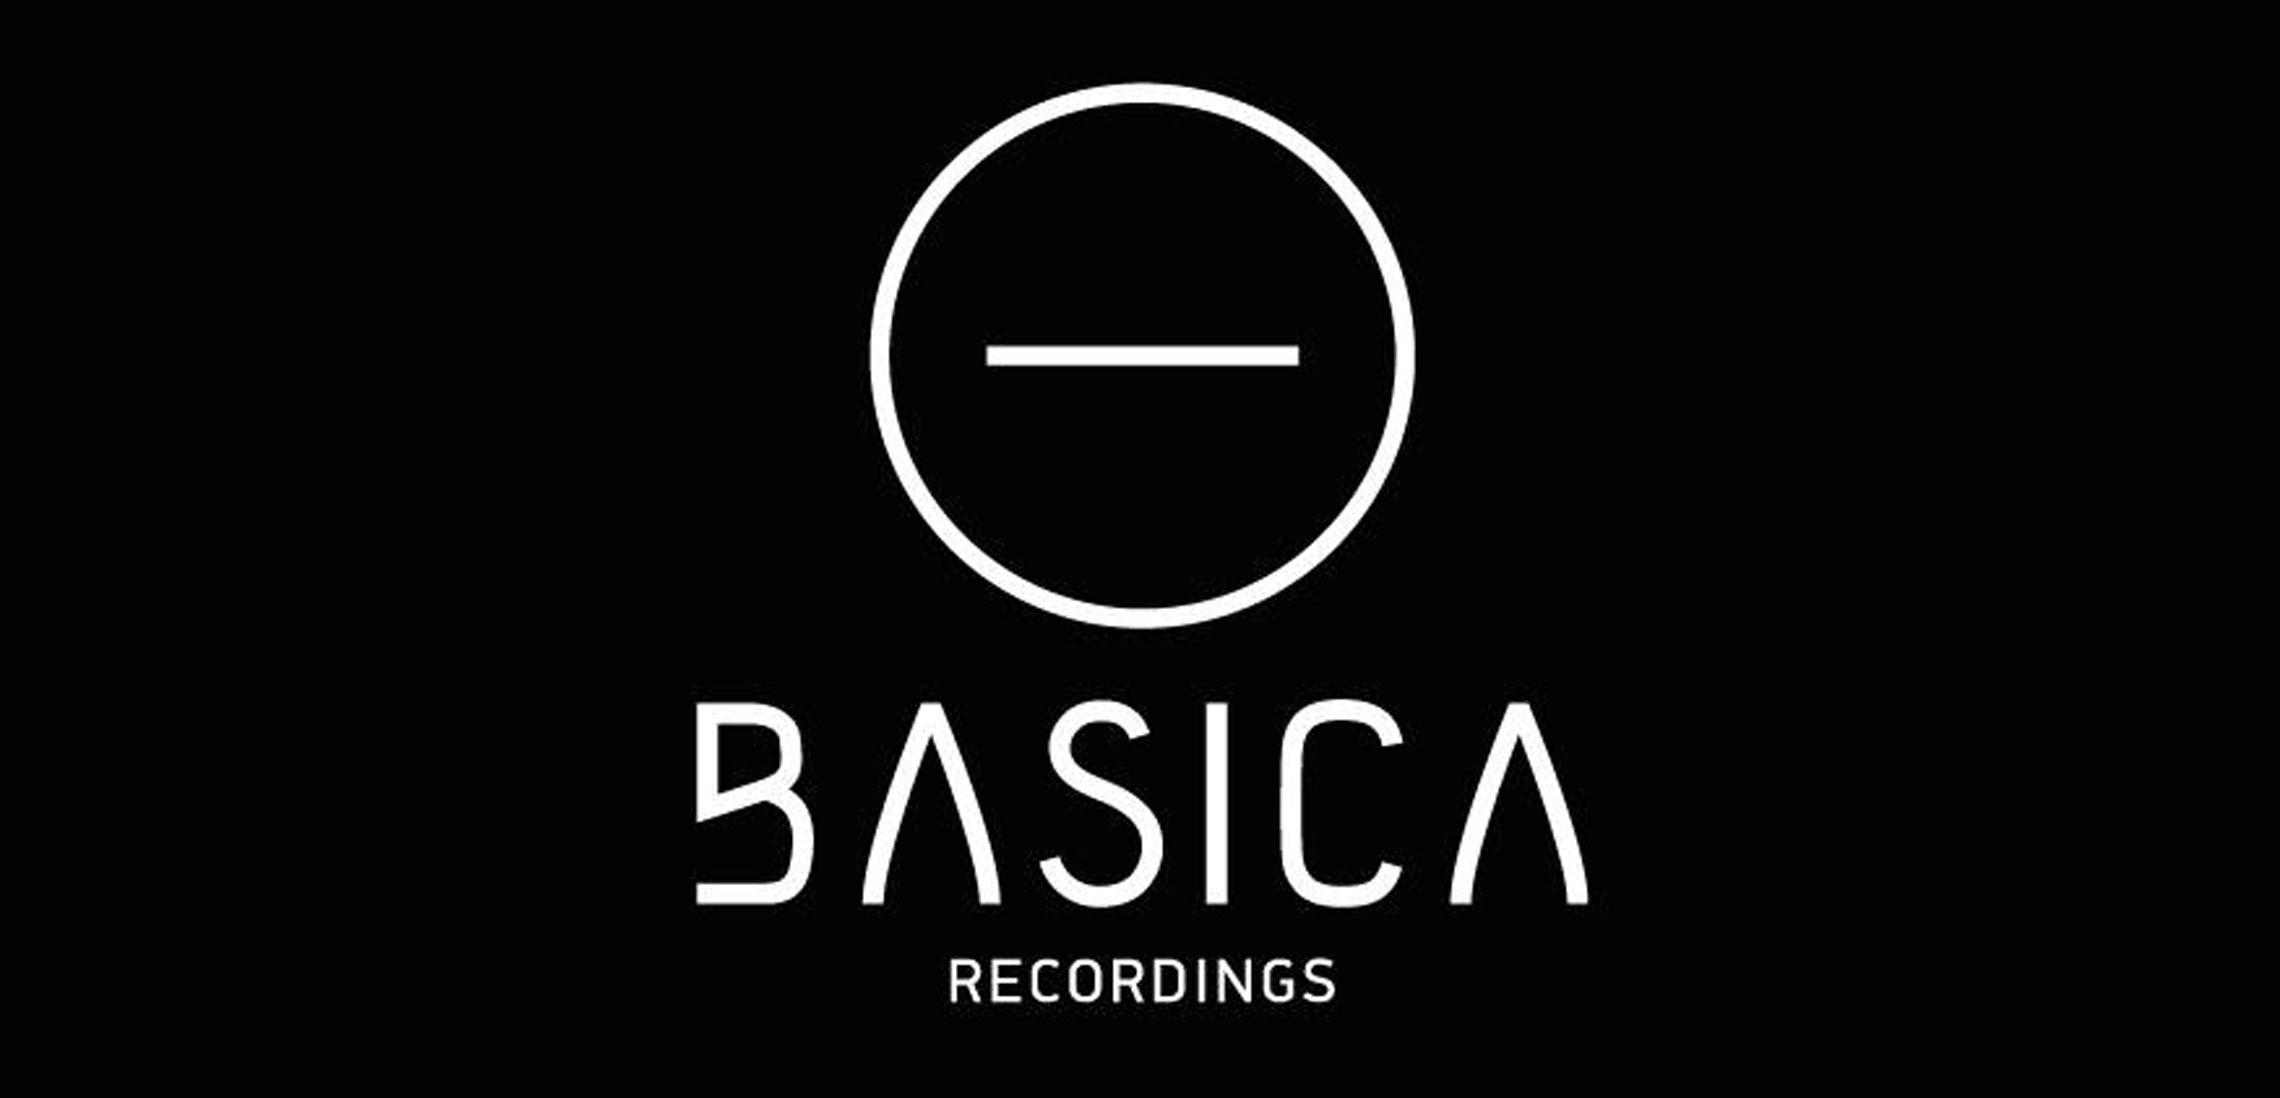 V.A. - Basica Ibiza 2019 hero